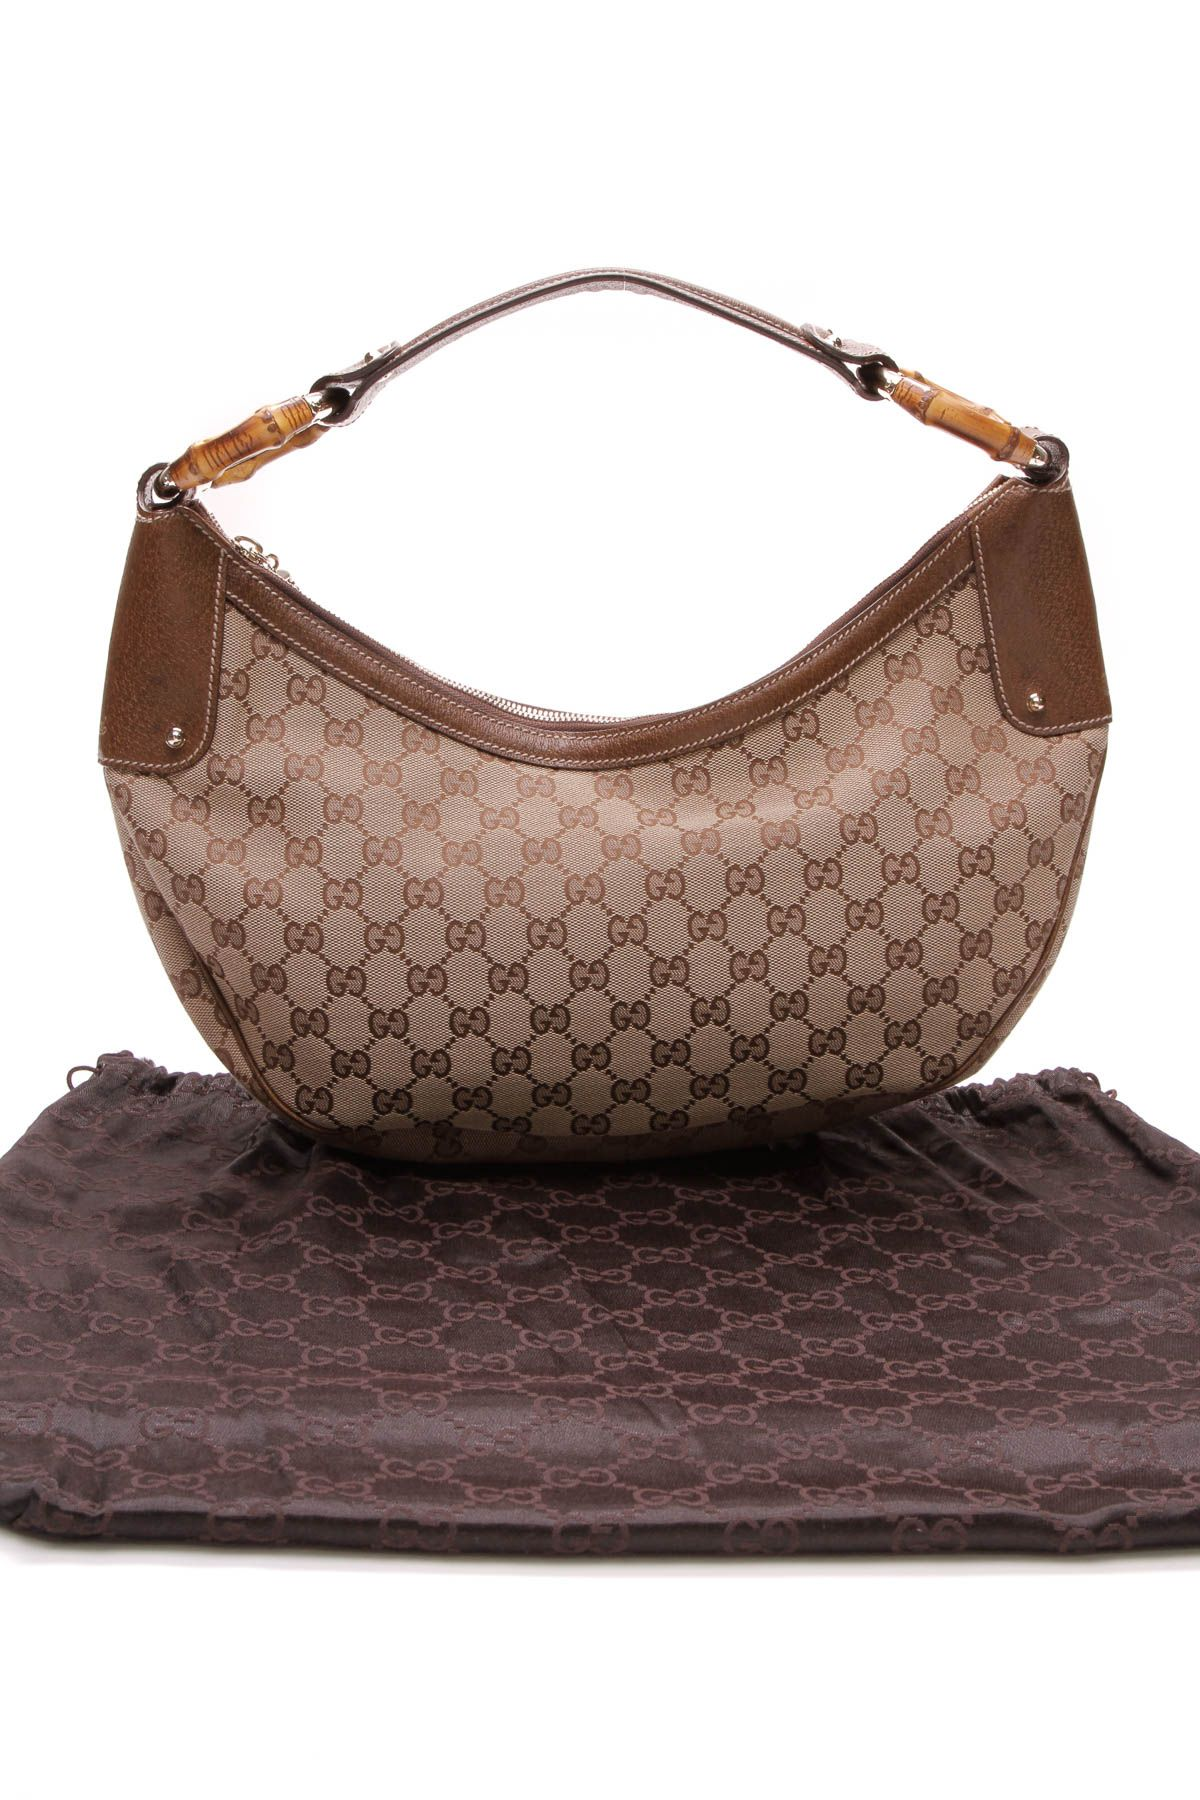 2de9d95b1f04fe Gucci Bamboo Ring Hobo Bag - GG Canvas   Gucci Glam   Gucci bamboo ...